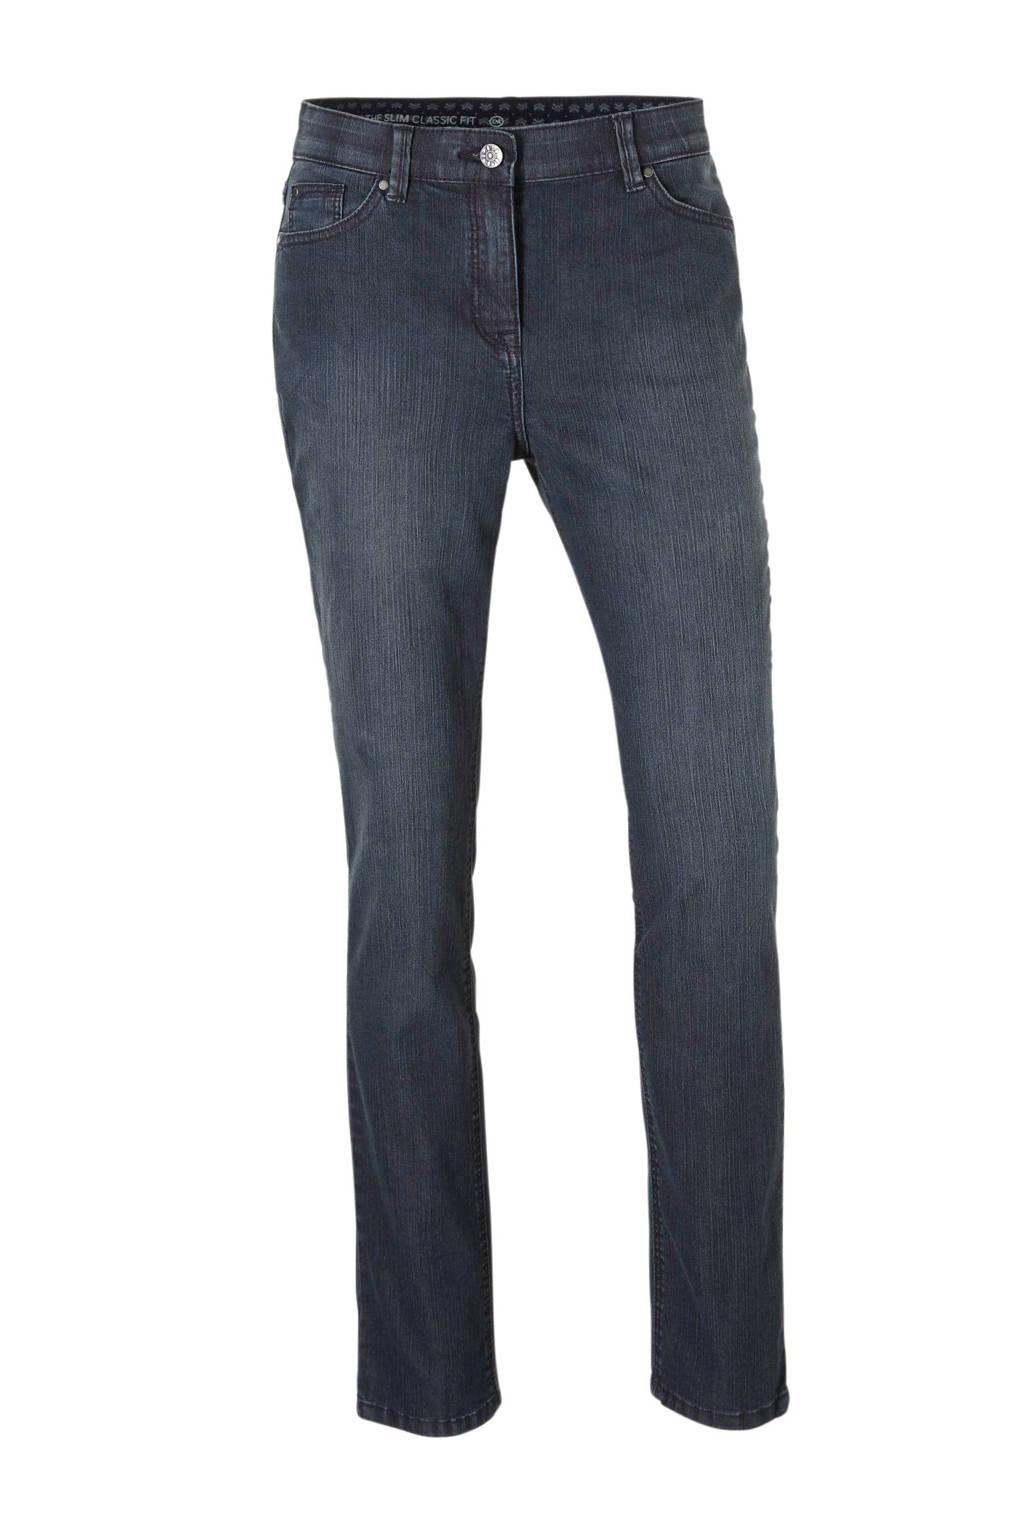 C&A The Denim slim fit jeans donkerblauw, Donkerblauw